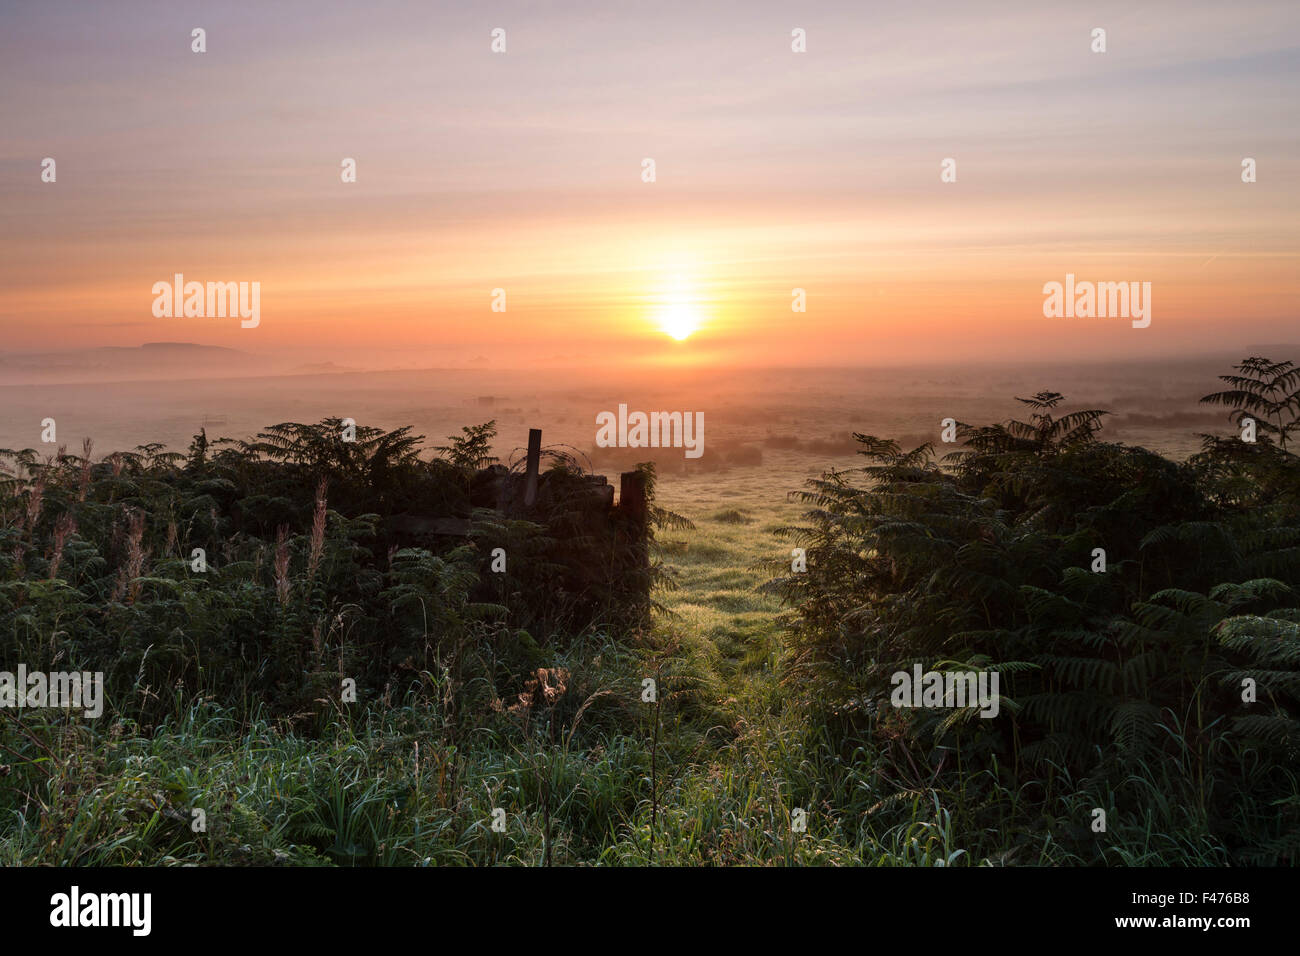 The Rising Sun Burning Through Mist on Farmland Teesdale, County Durham UK - Stock Image